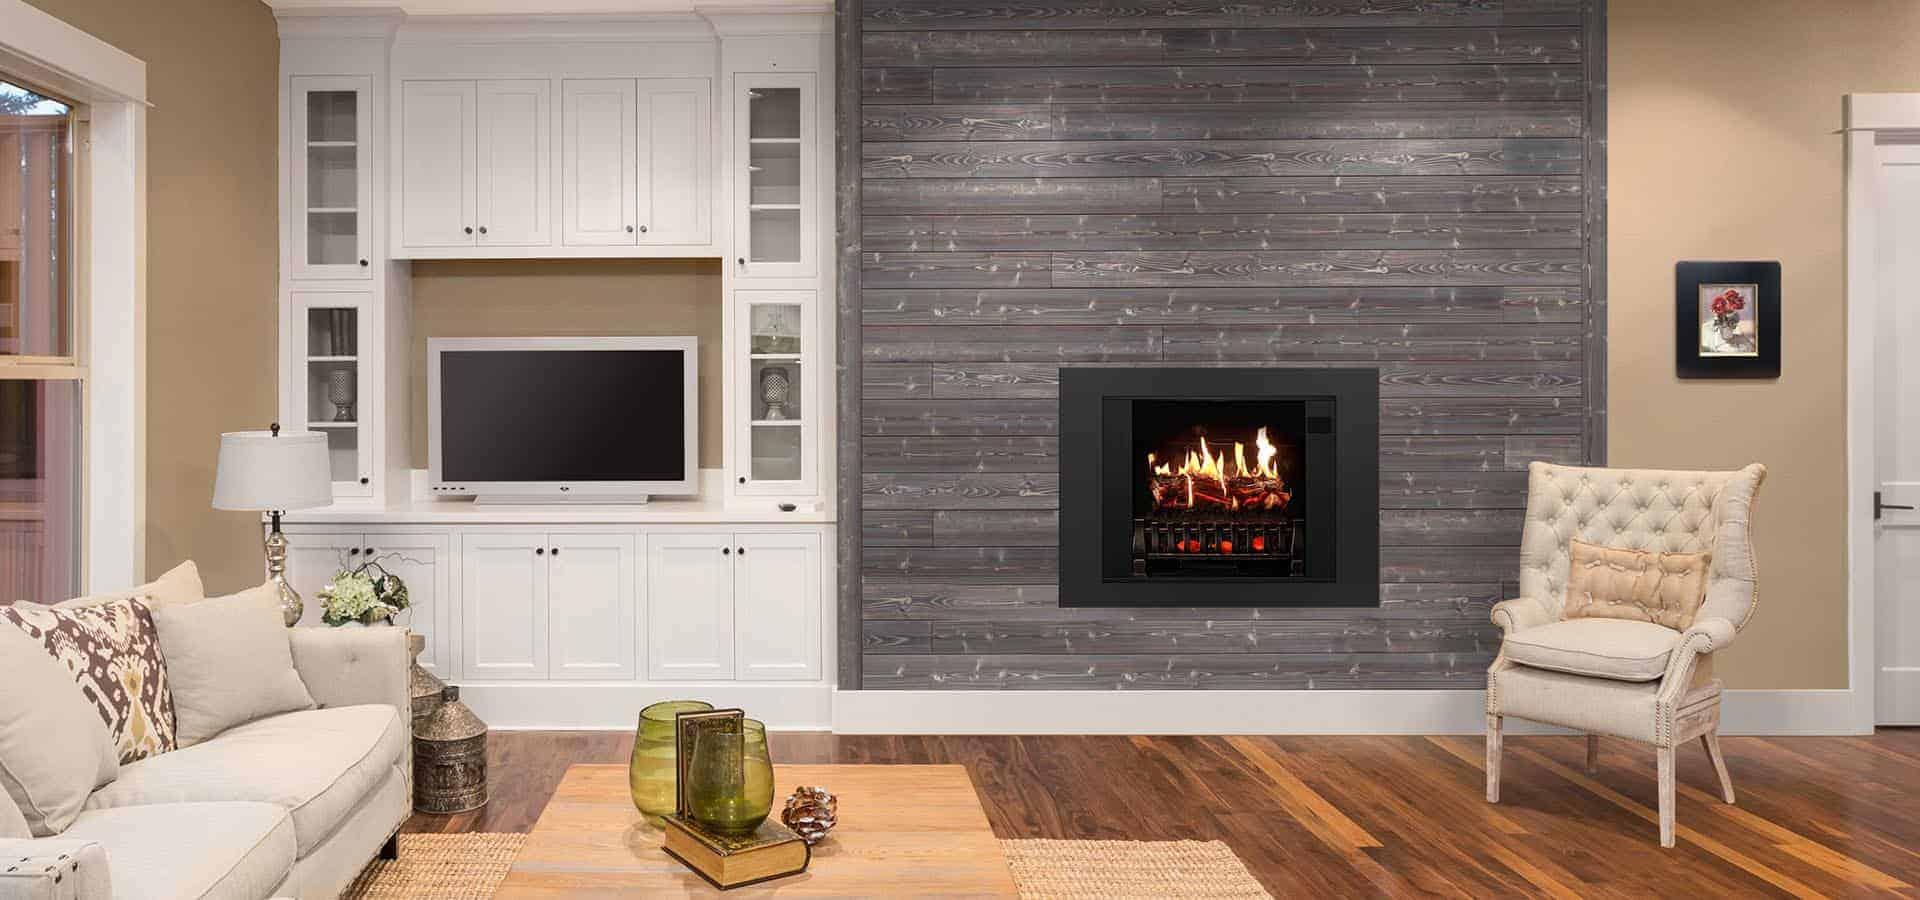 fireplace 2021